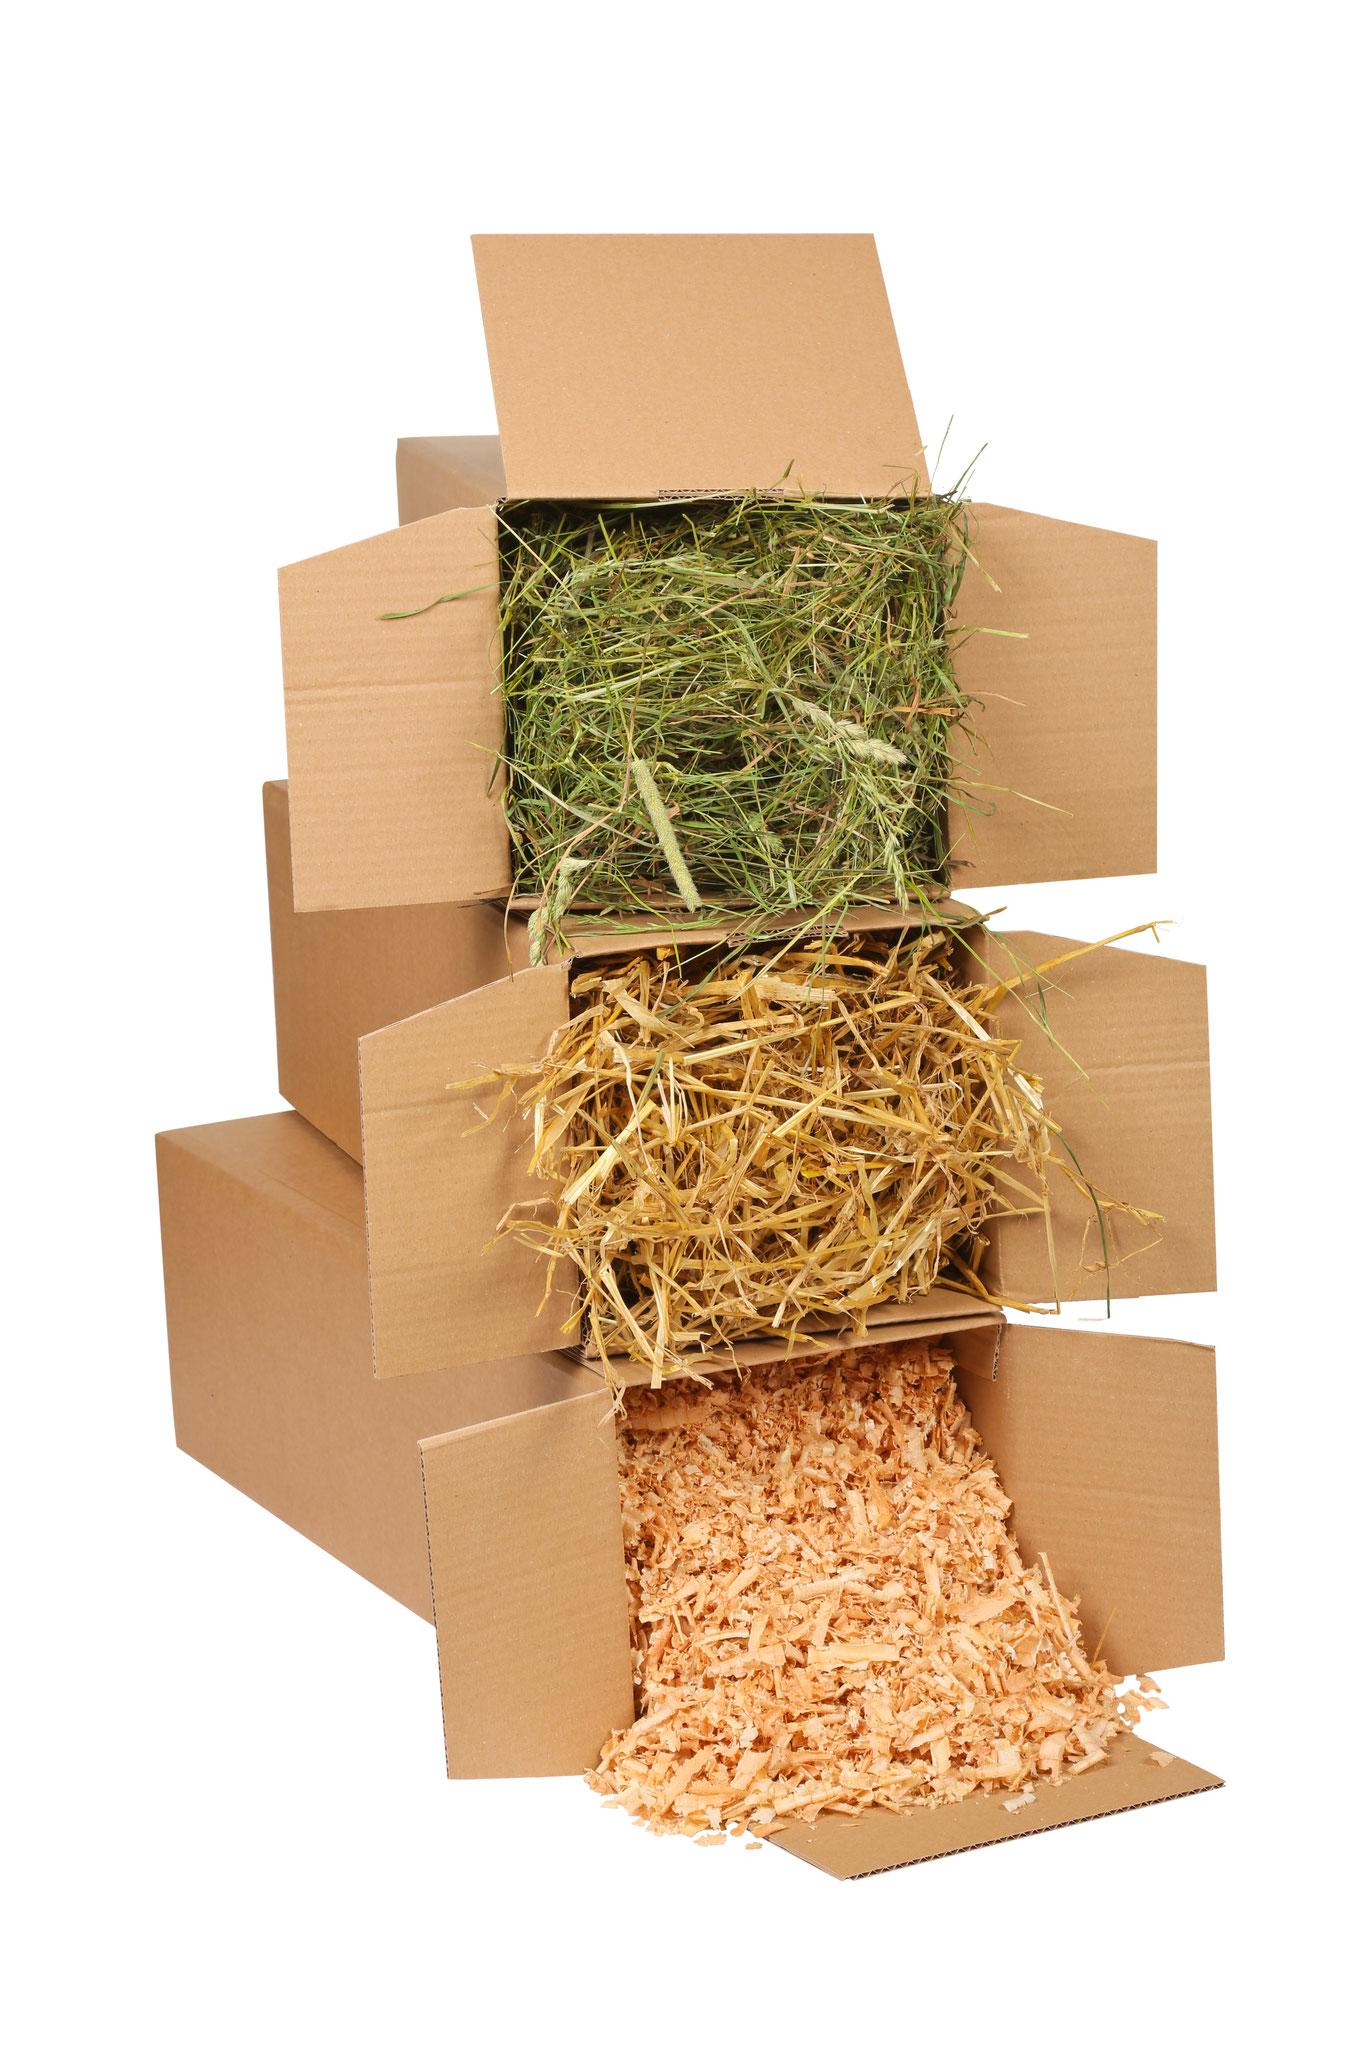 My-Heu-Box: Kleine Mengen ganz individuell